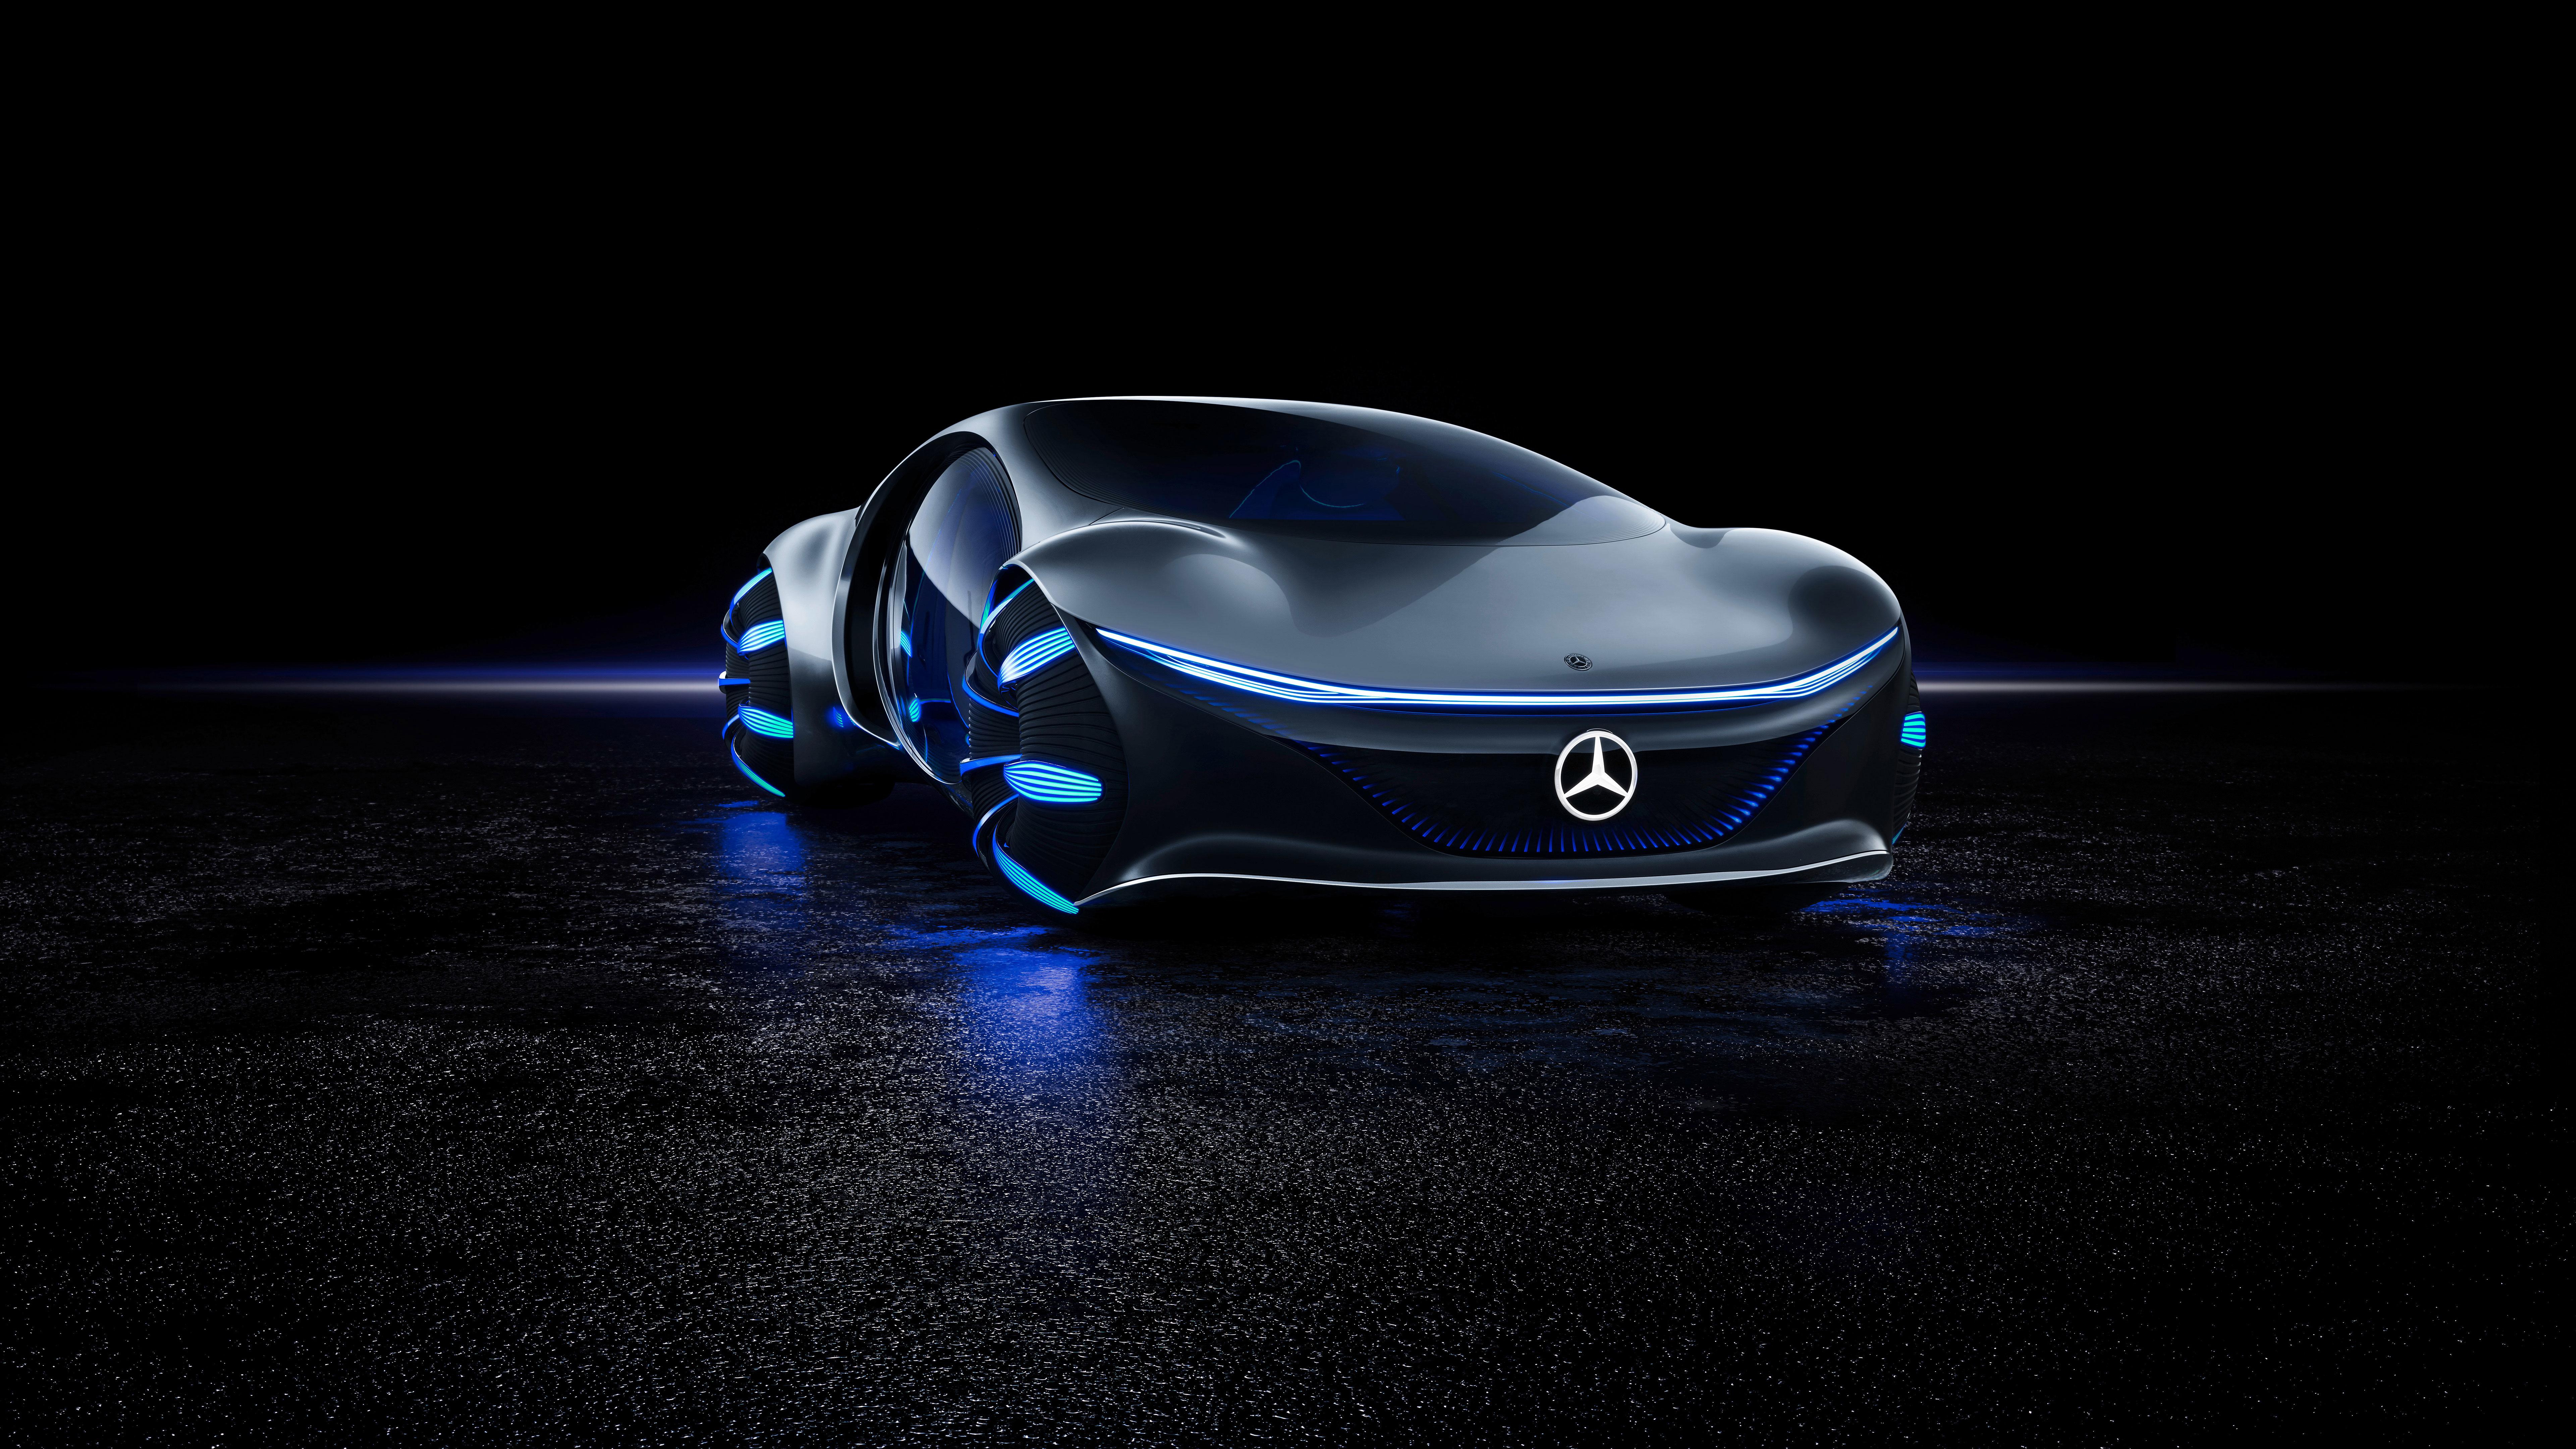 Mercedes Benz Vision 8K Wallpaper